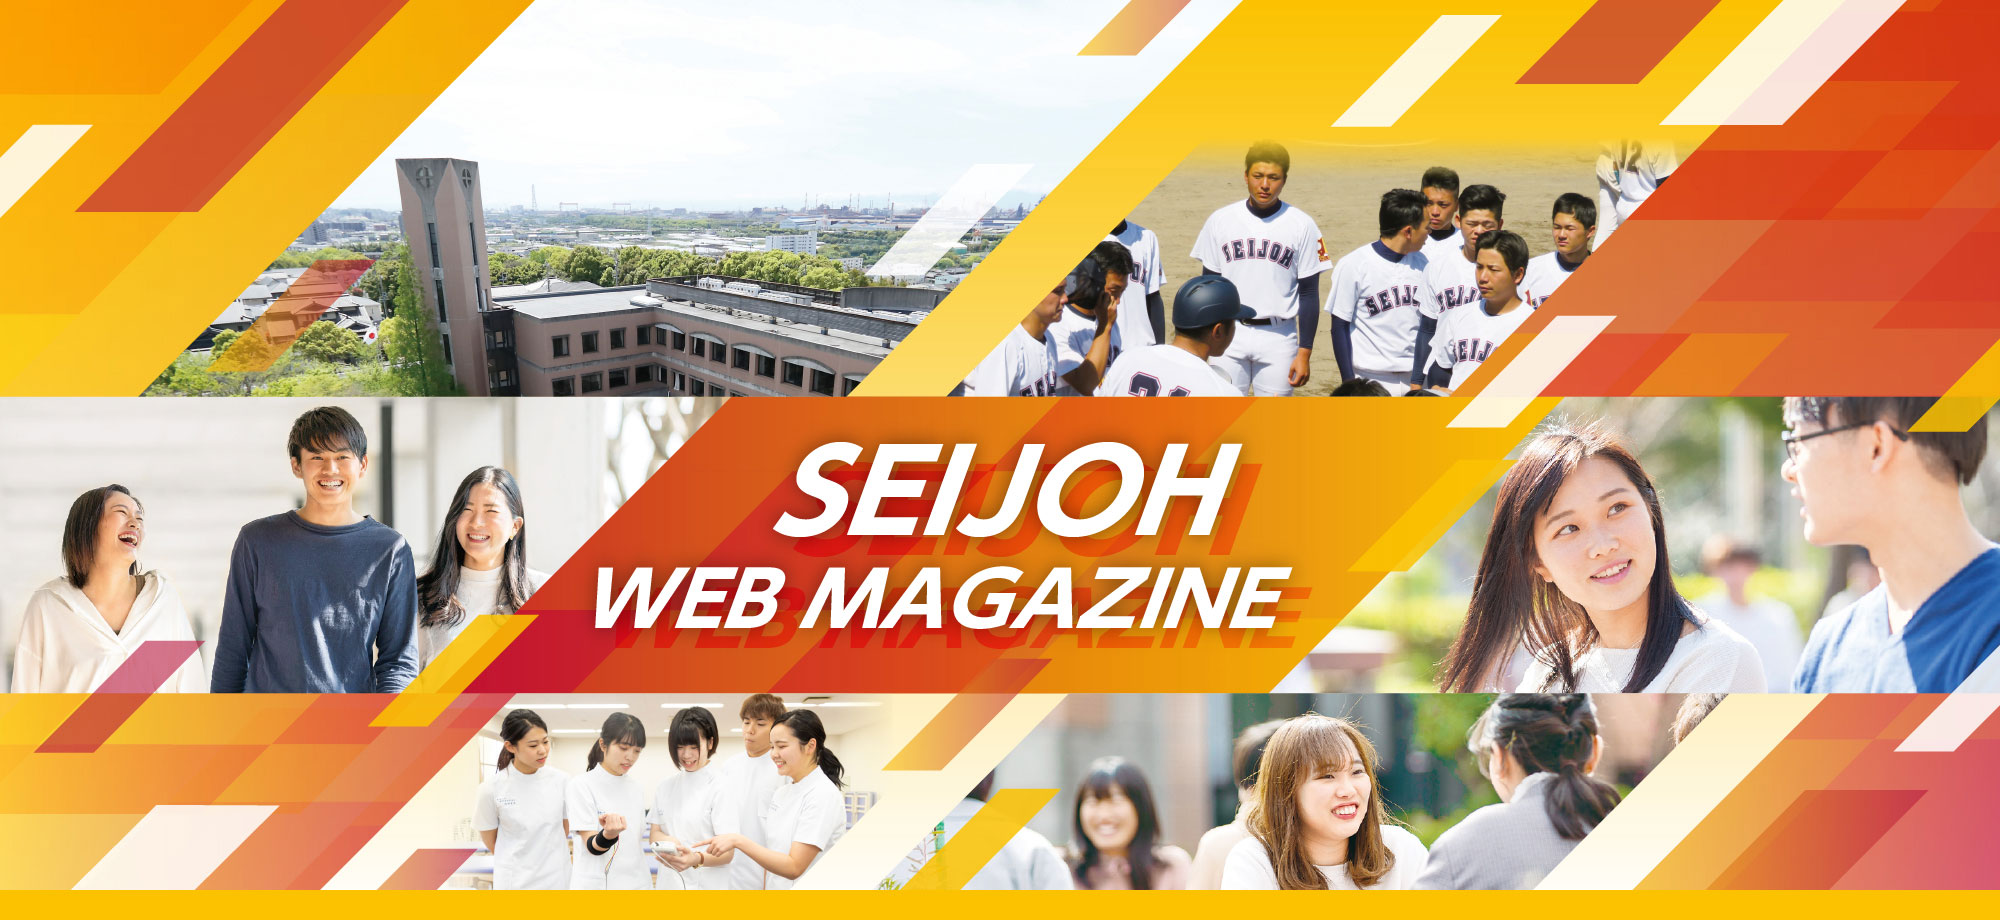 SEIJOH WEB MAGAZINE